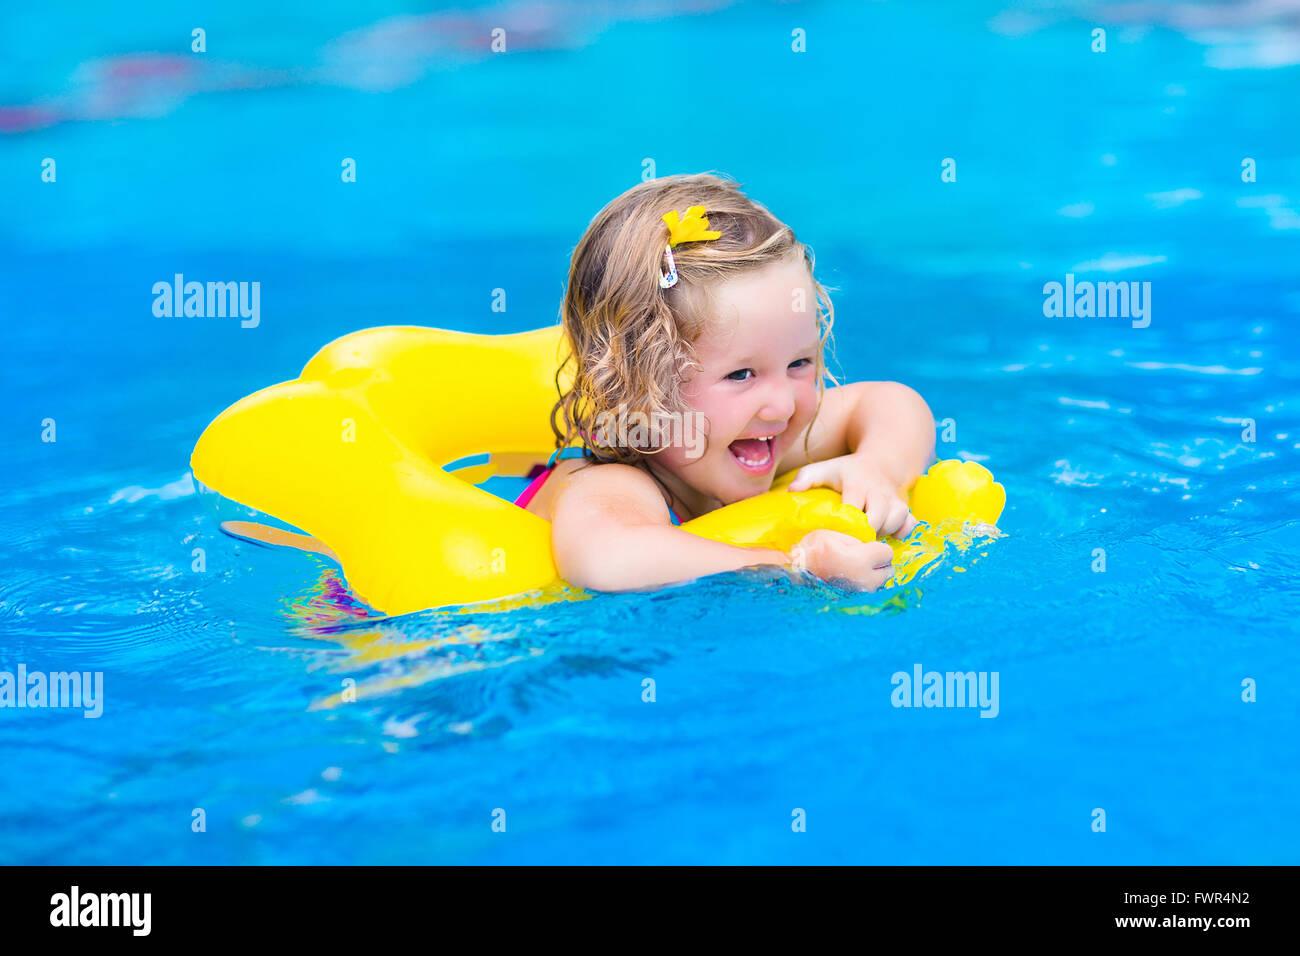 Toddler inflatable toy beach stockfotos